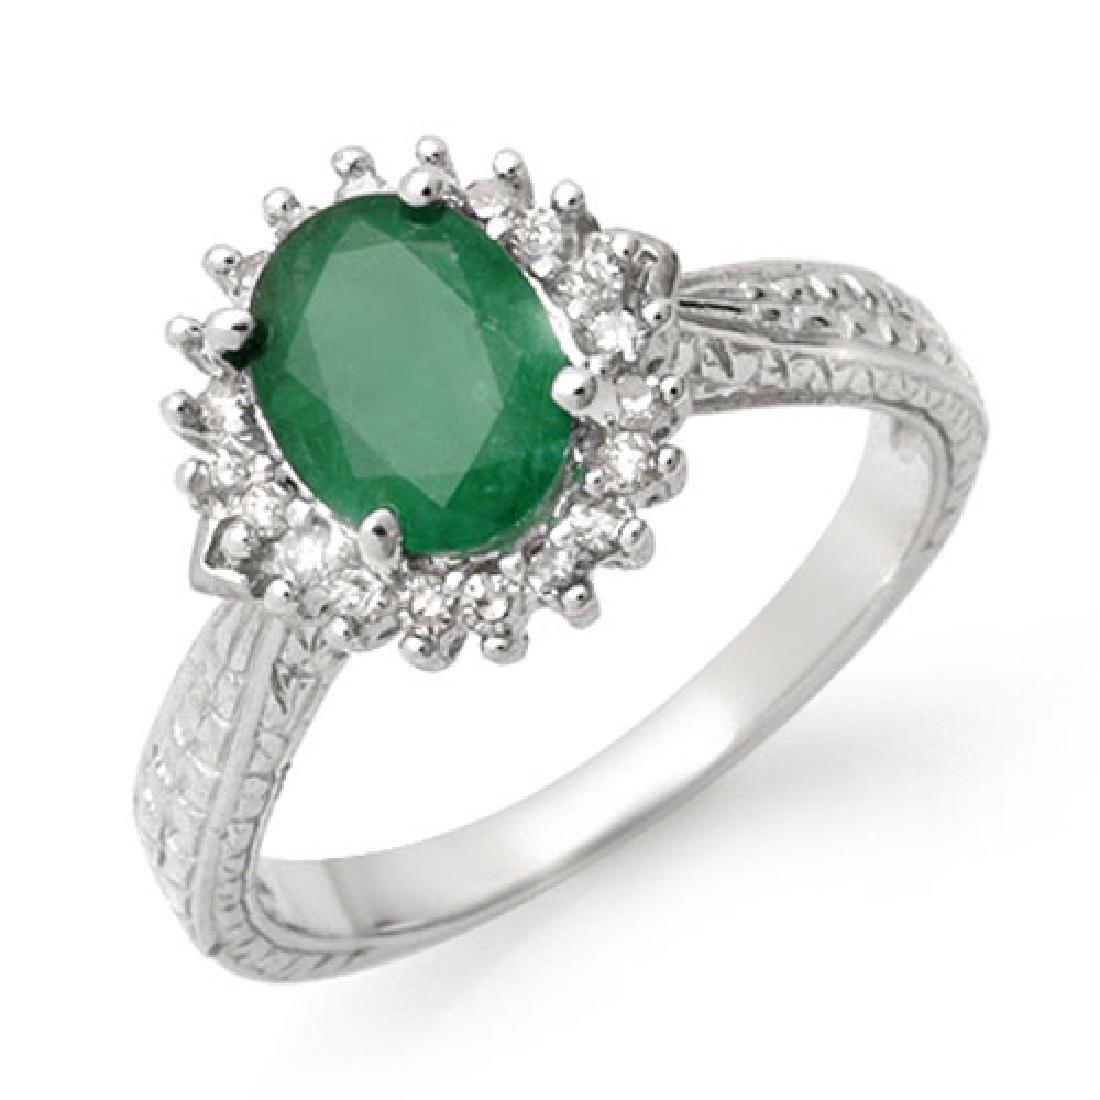 2.75 CTW Emerald & Diamond Ring 10K White Gold